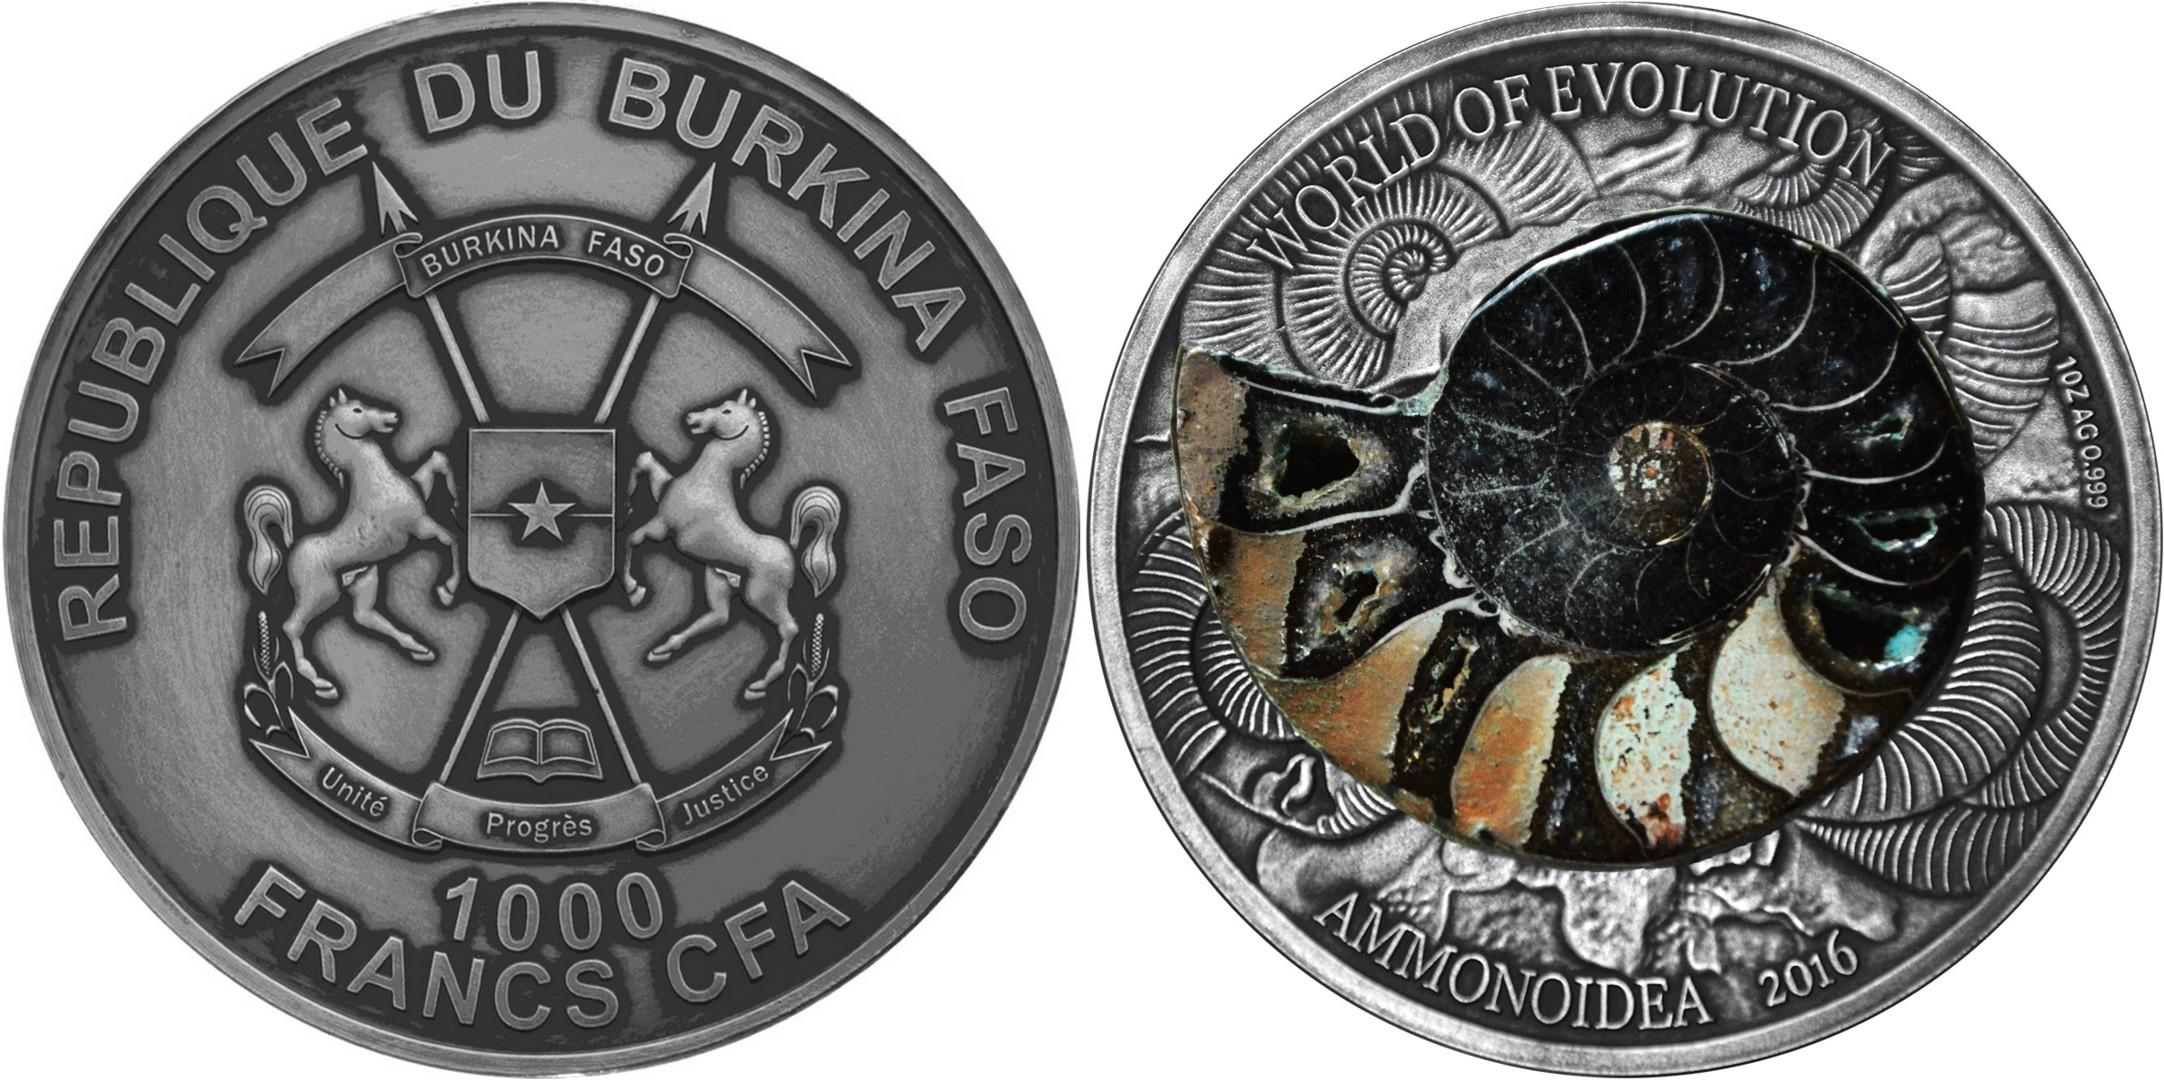 burkina faso 2016 ammonite noire